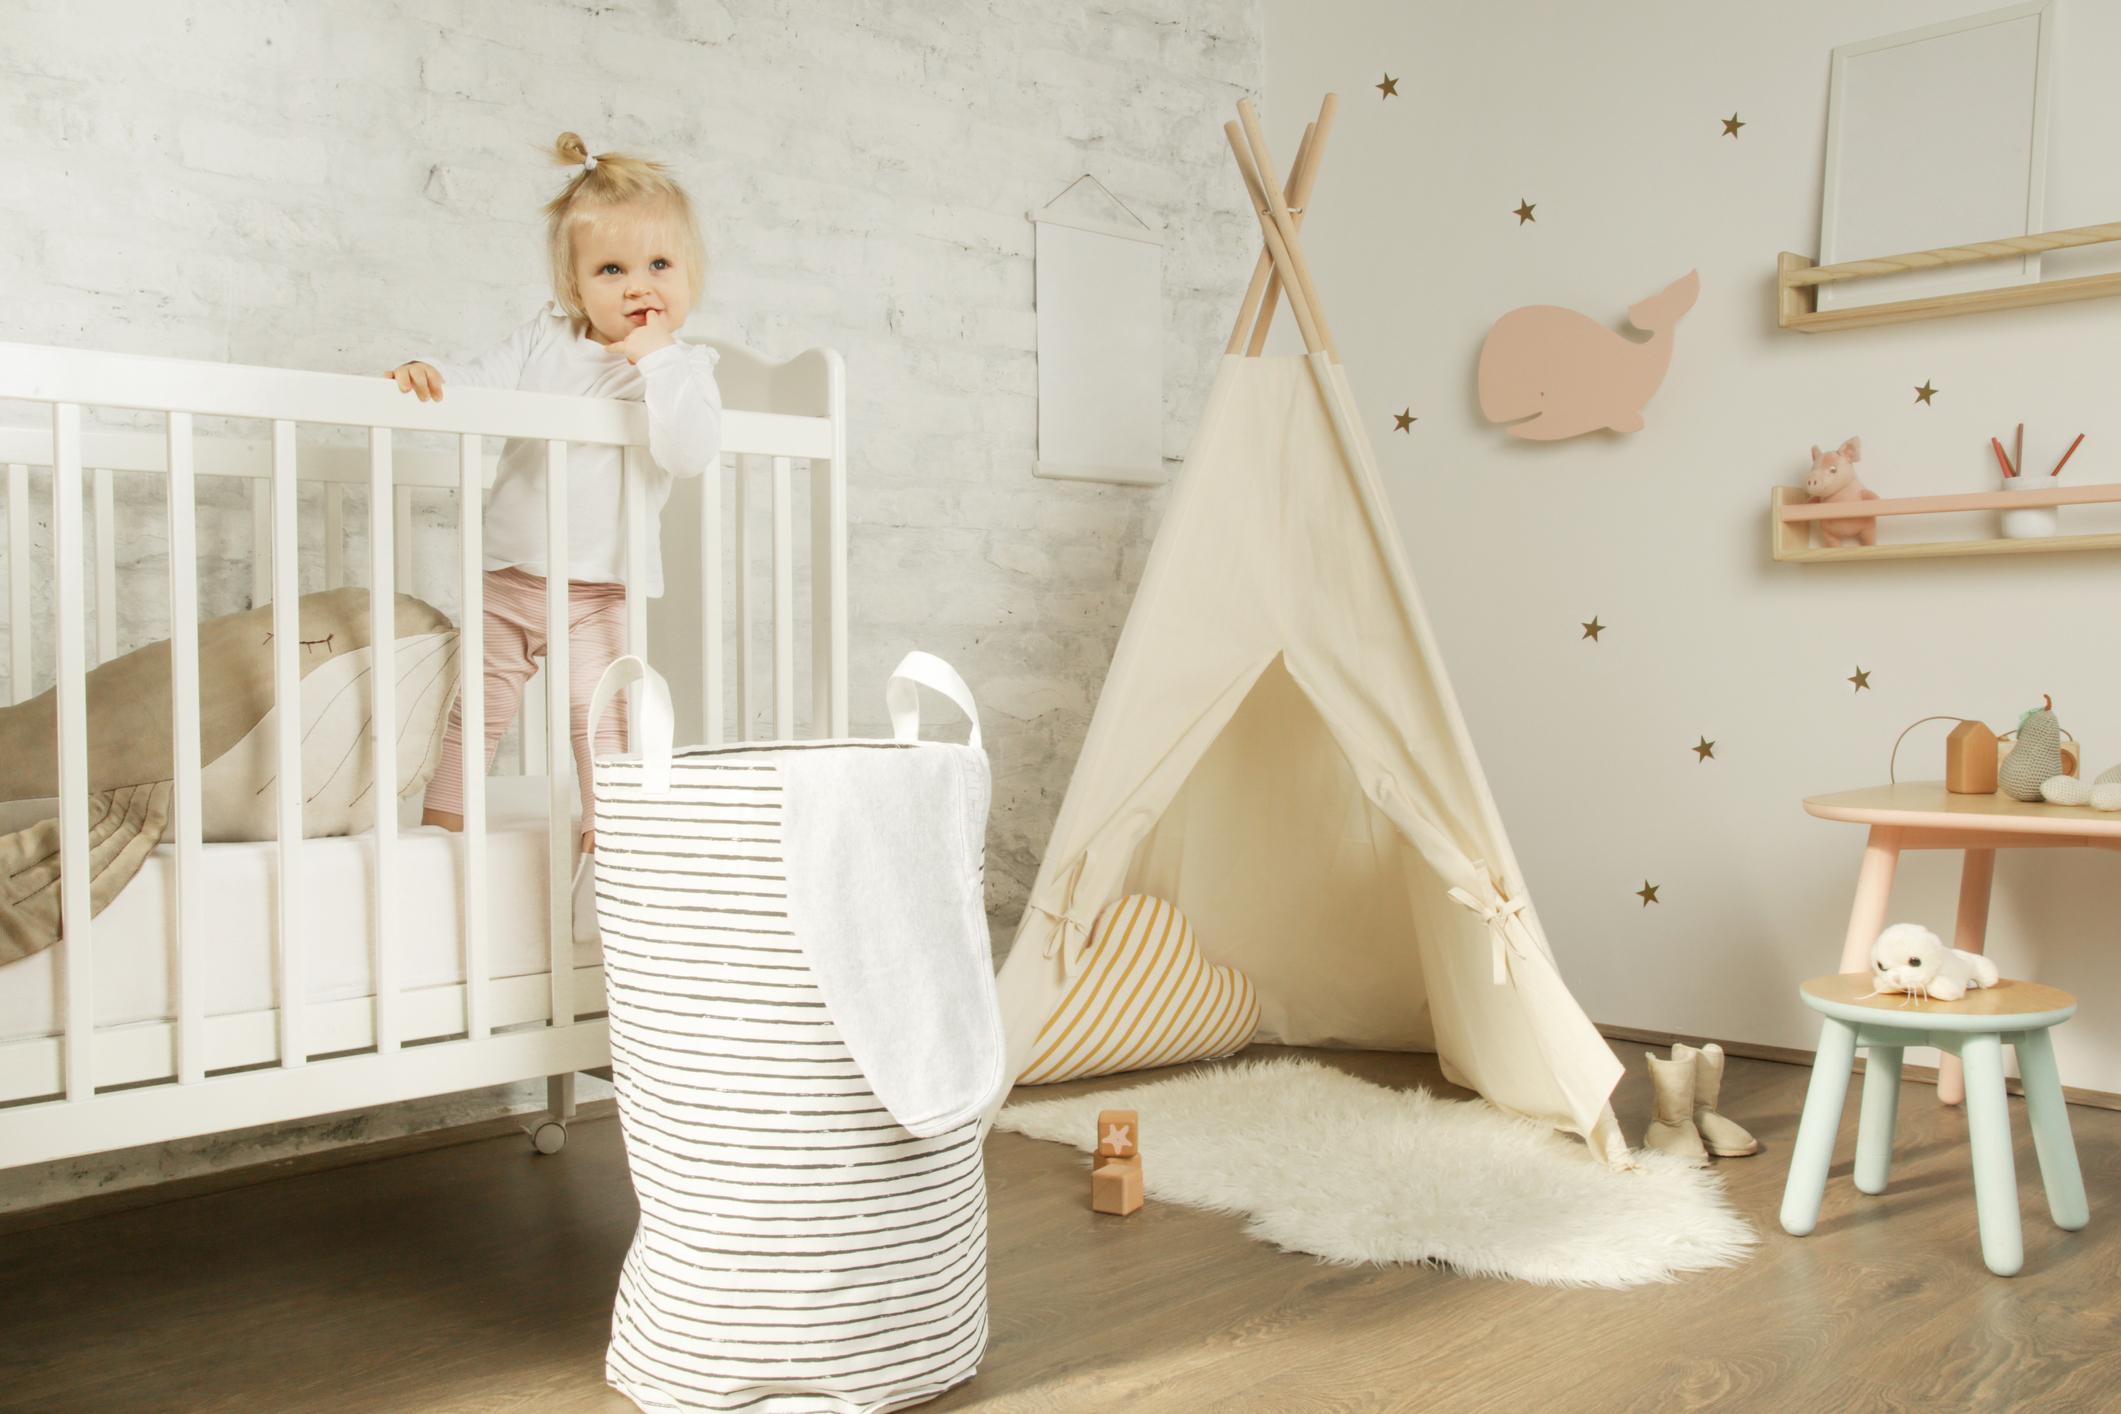 chambre de bebe on l amenage la plus